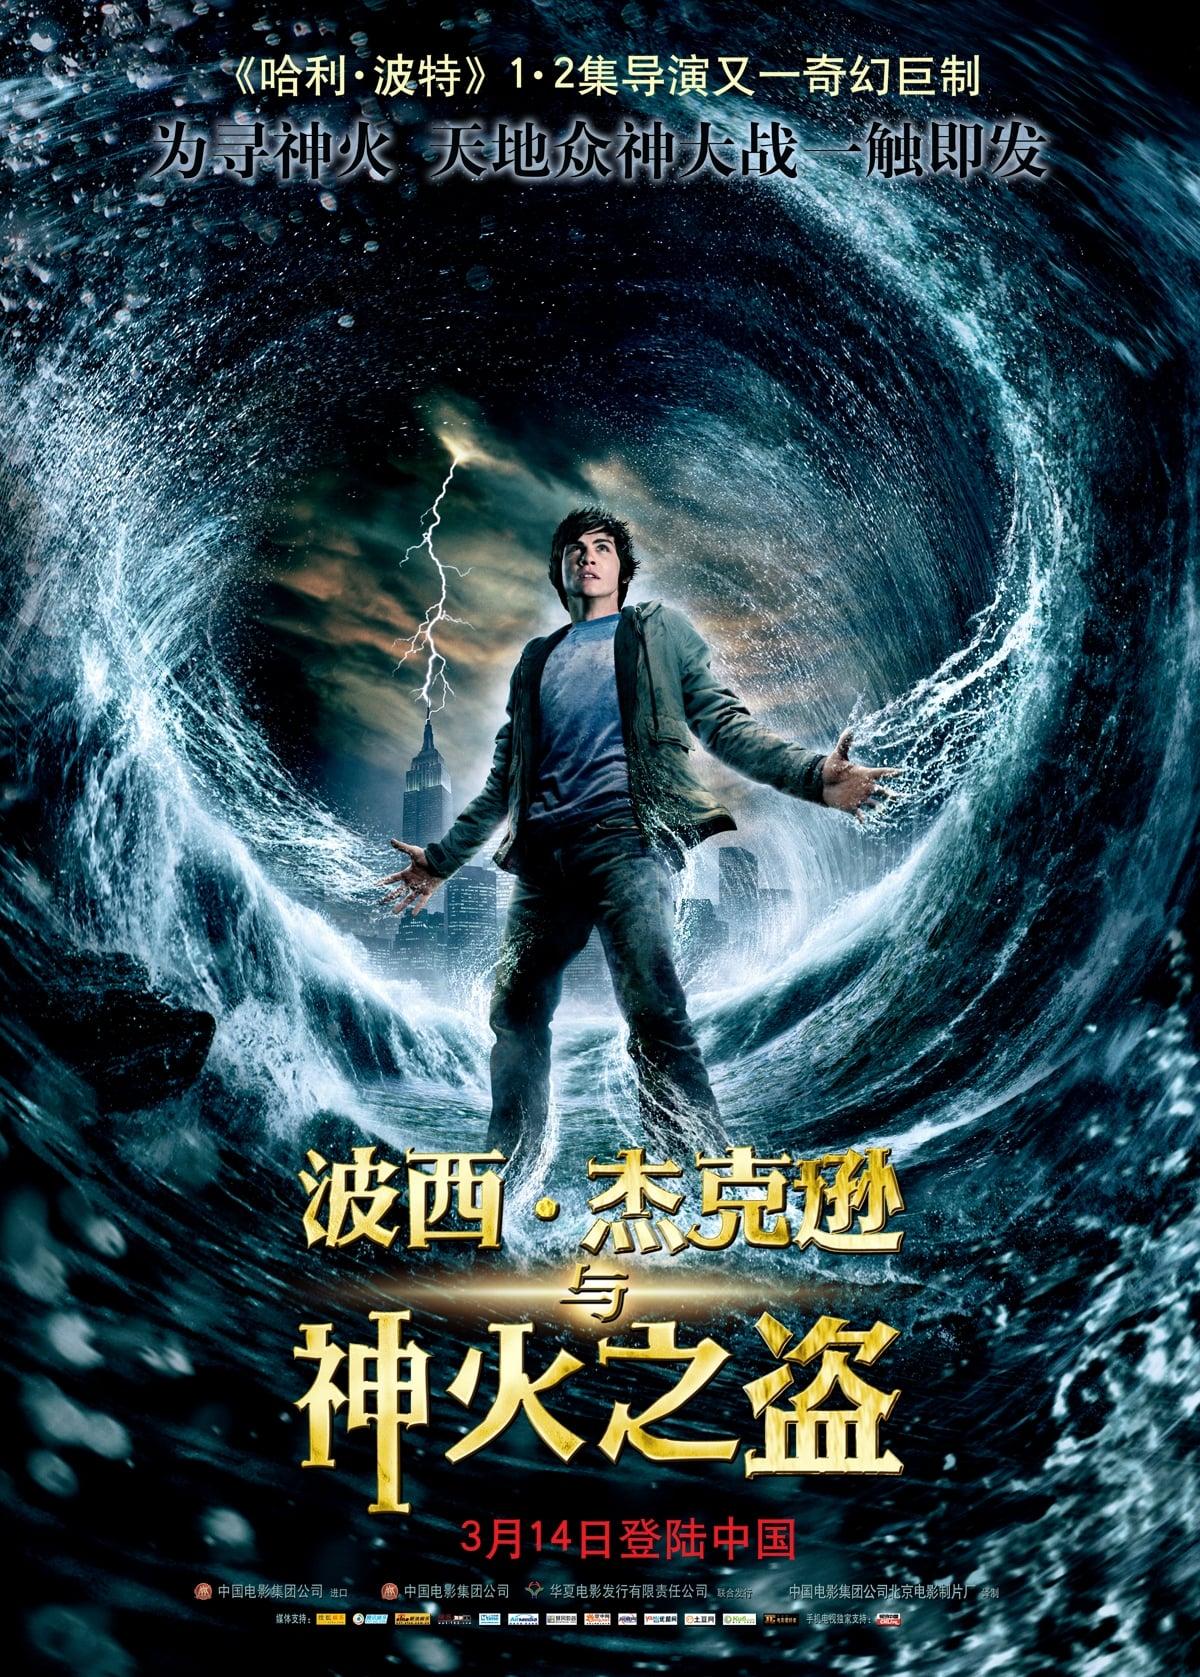 Percy Jackson Film Stream